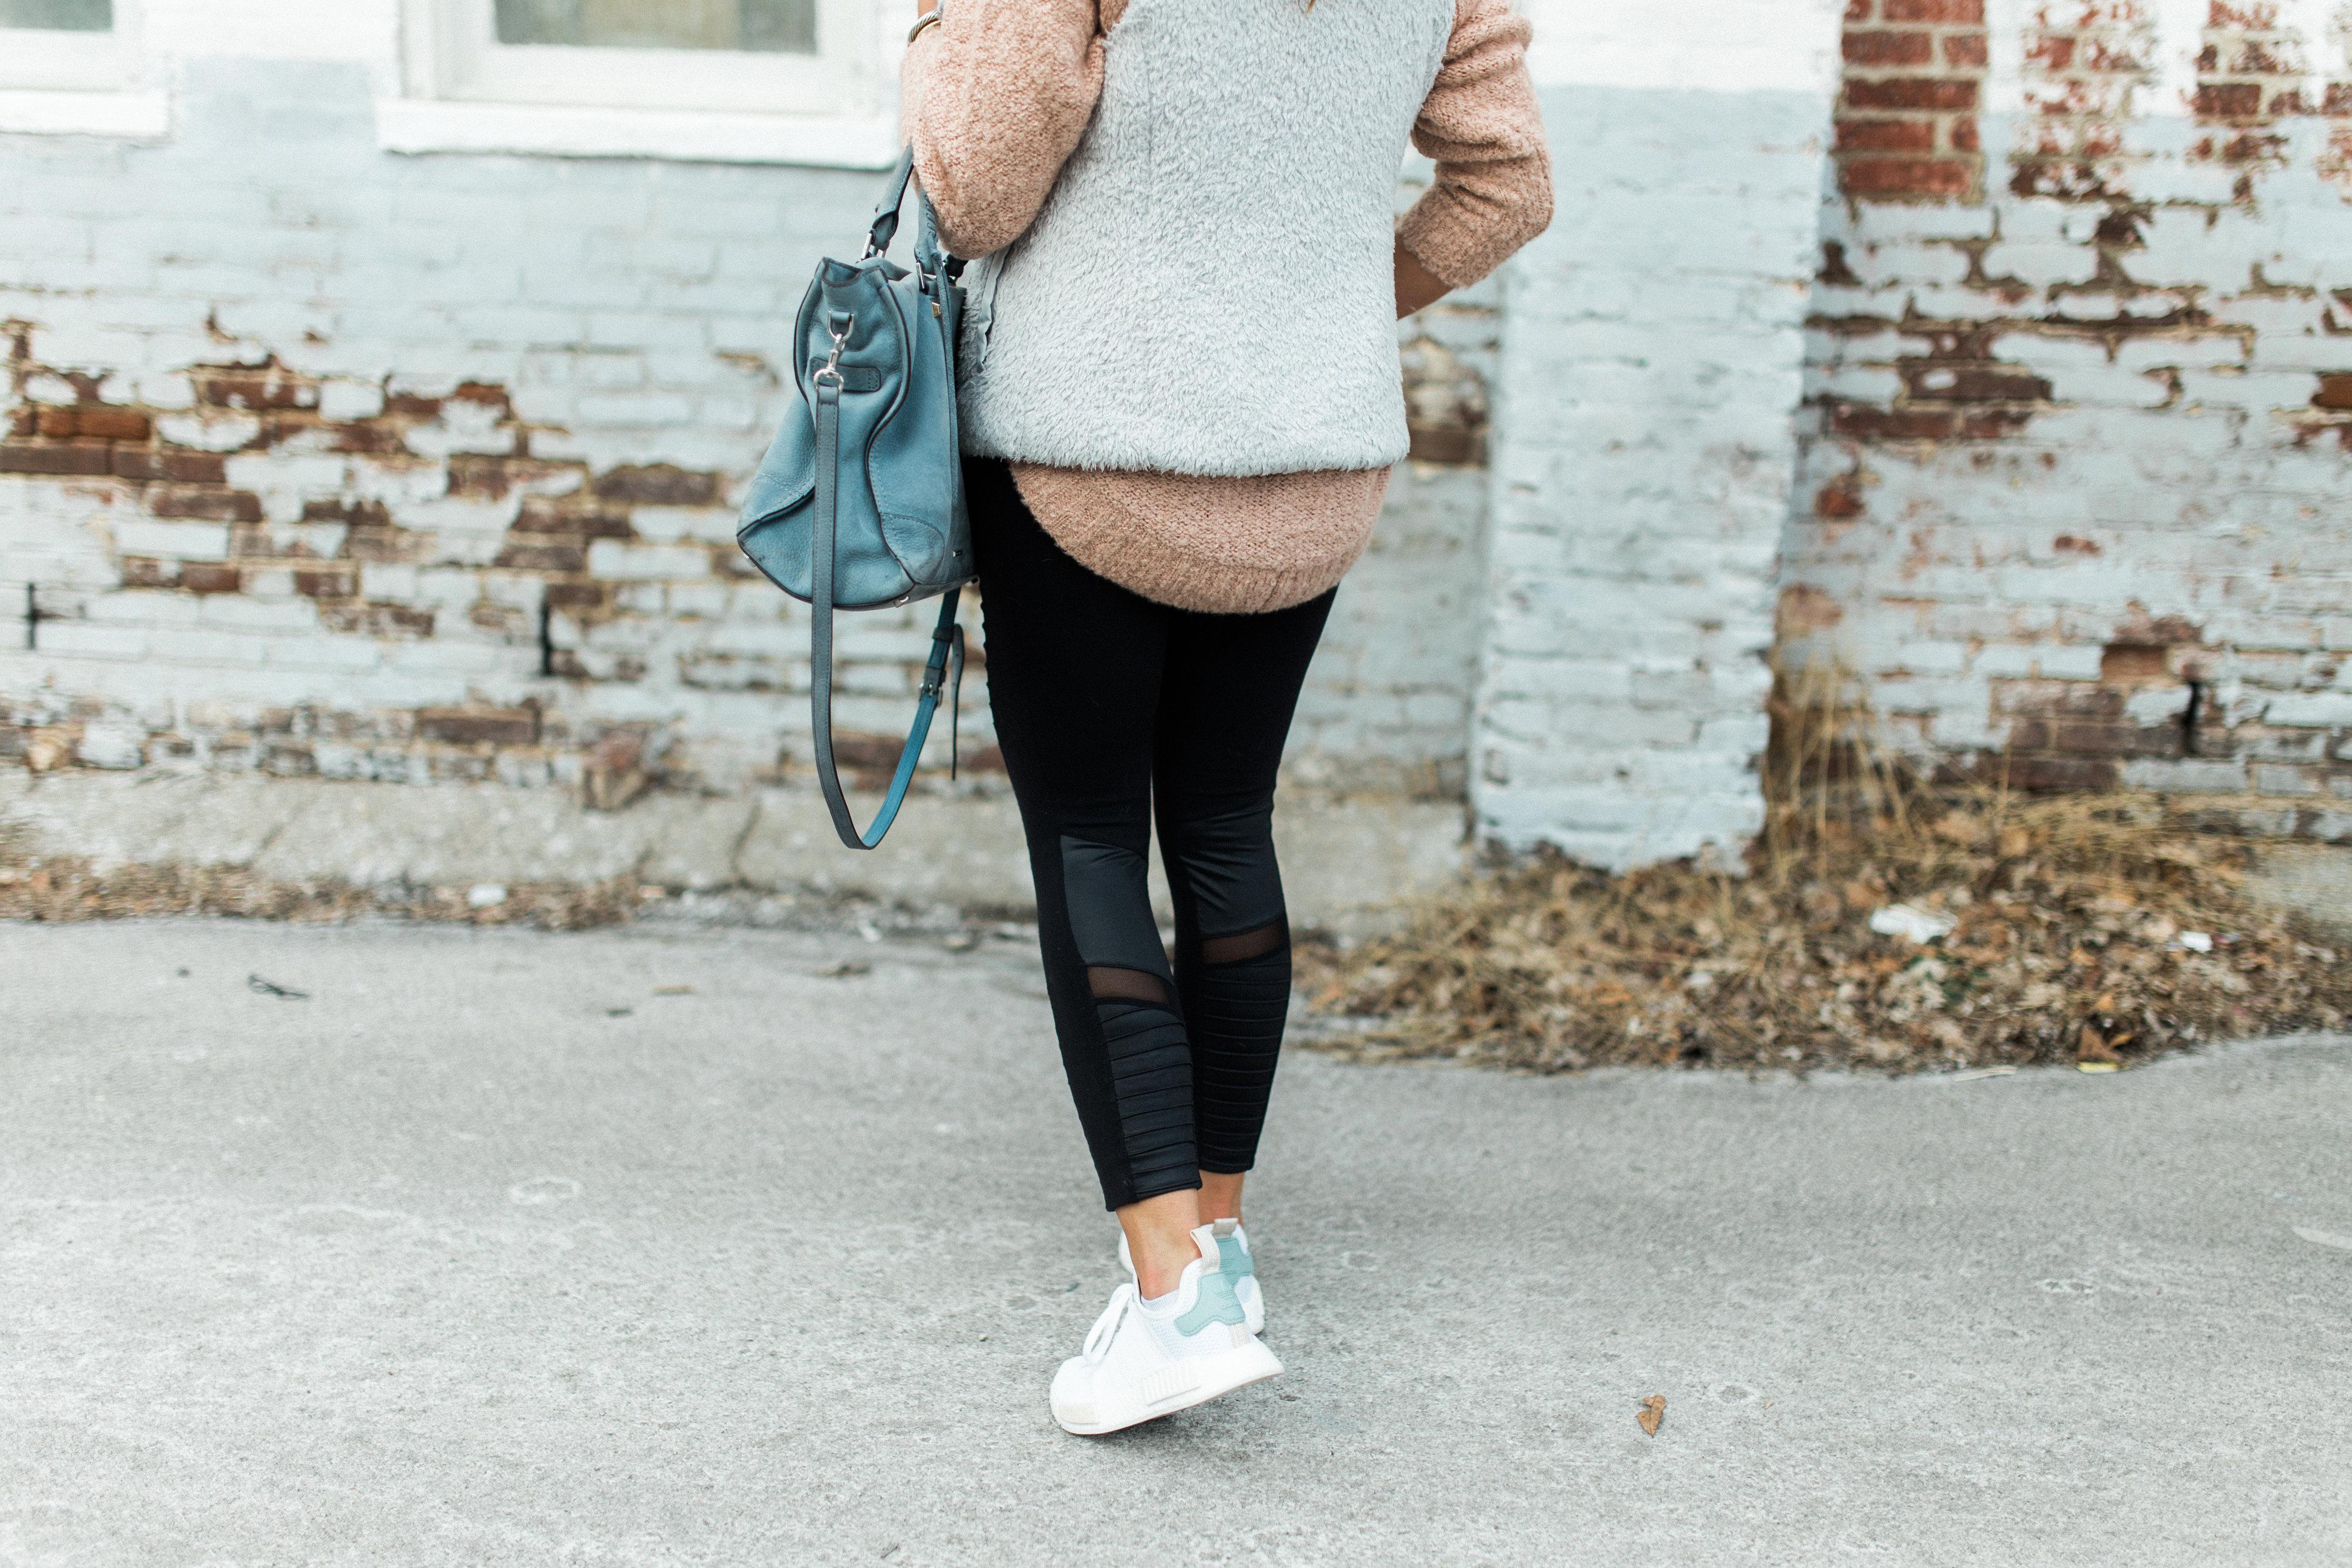 Athleisure Outfit Inspiration // Ft. Alo Moto Leggings, Adidas NMD Sneakers, Patagonia Los Gatos Vest, Rebecca Minkoff Handbag